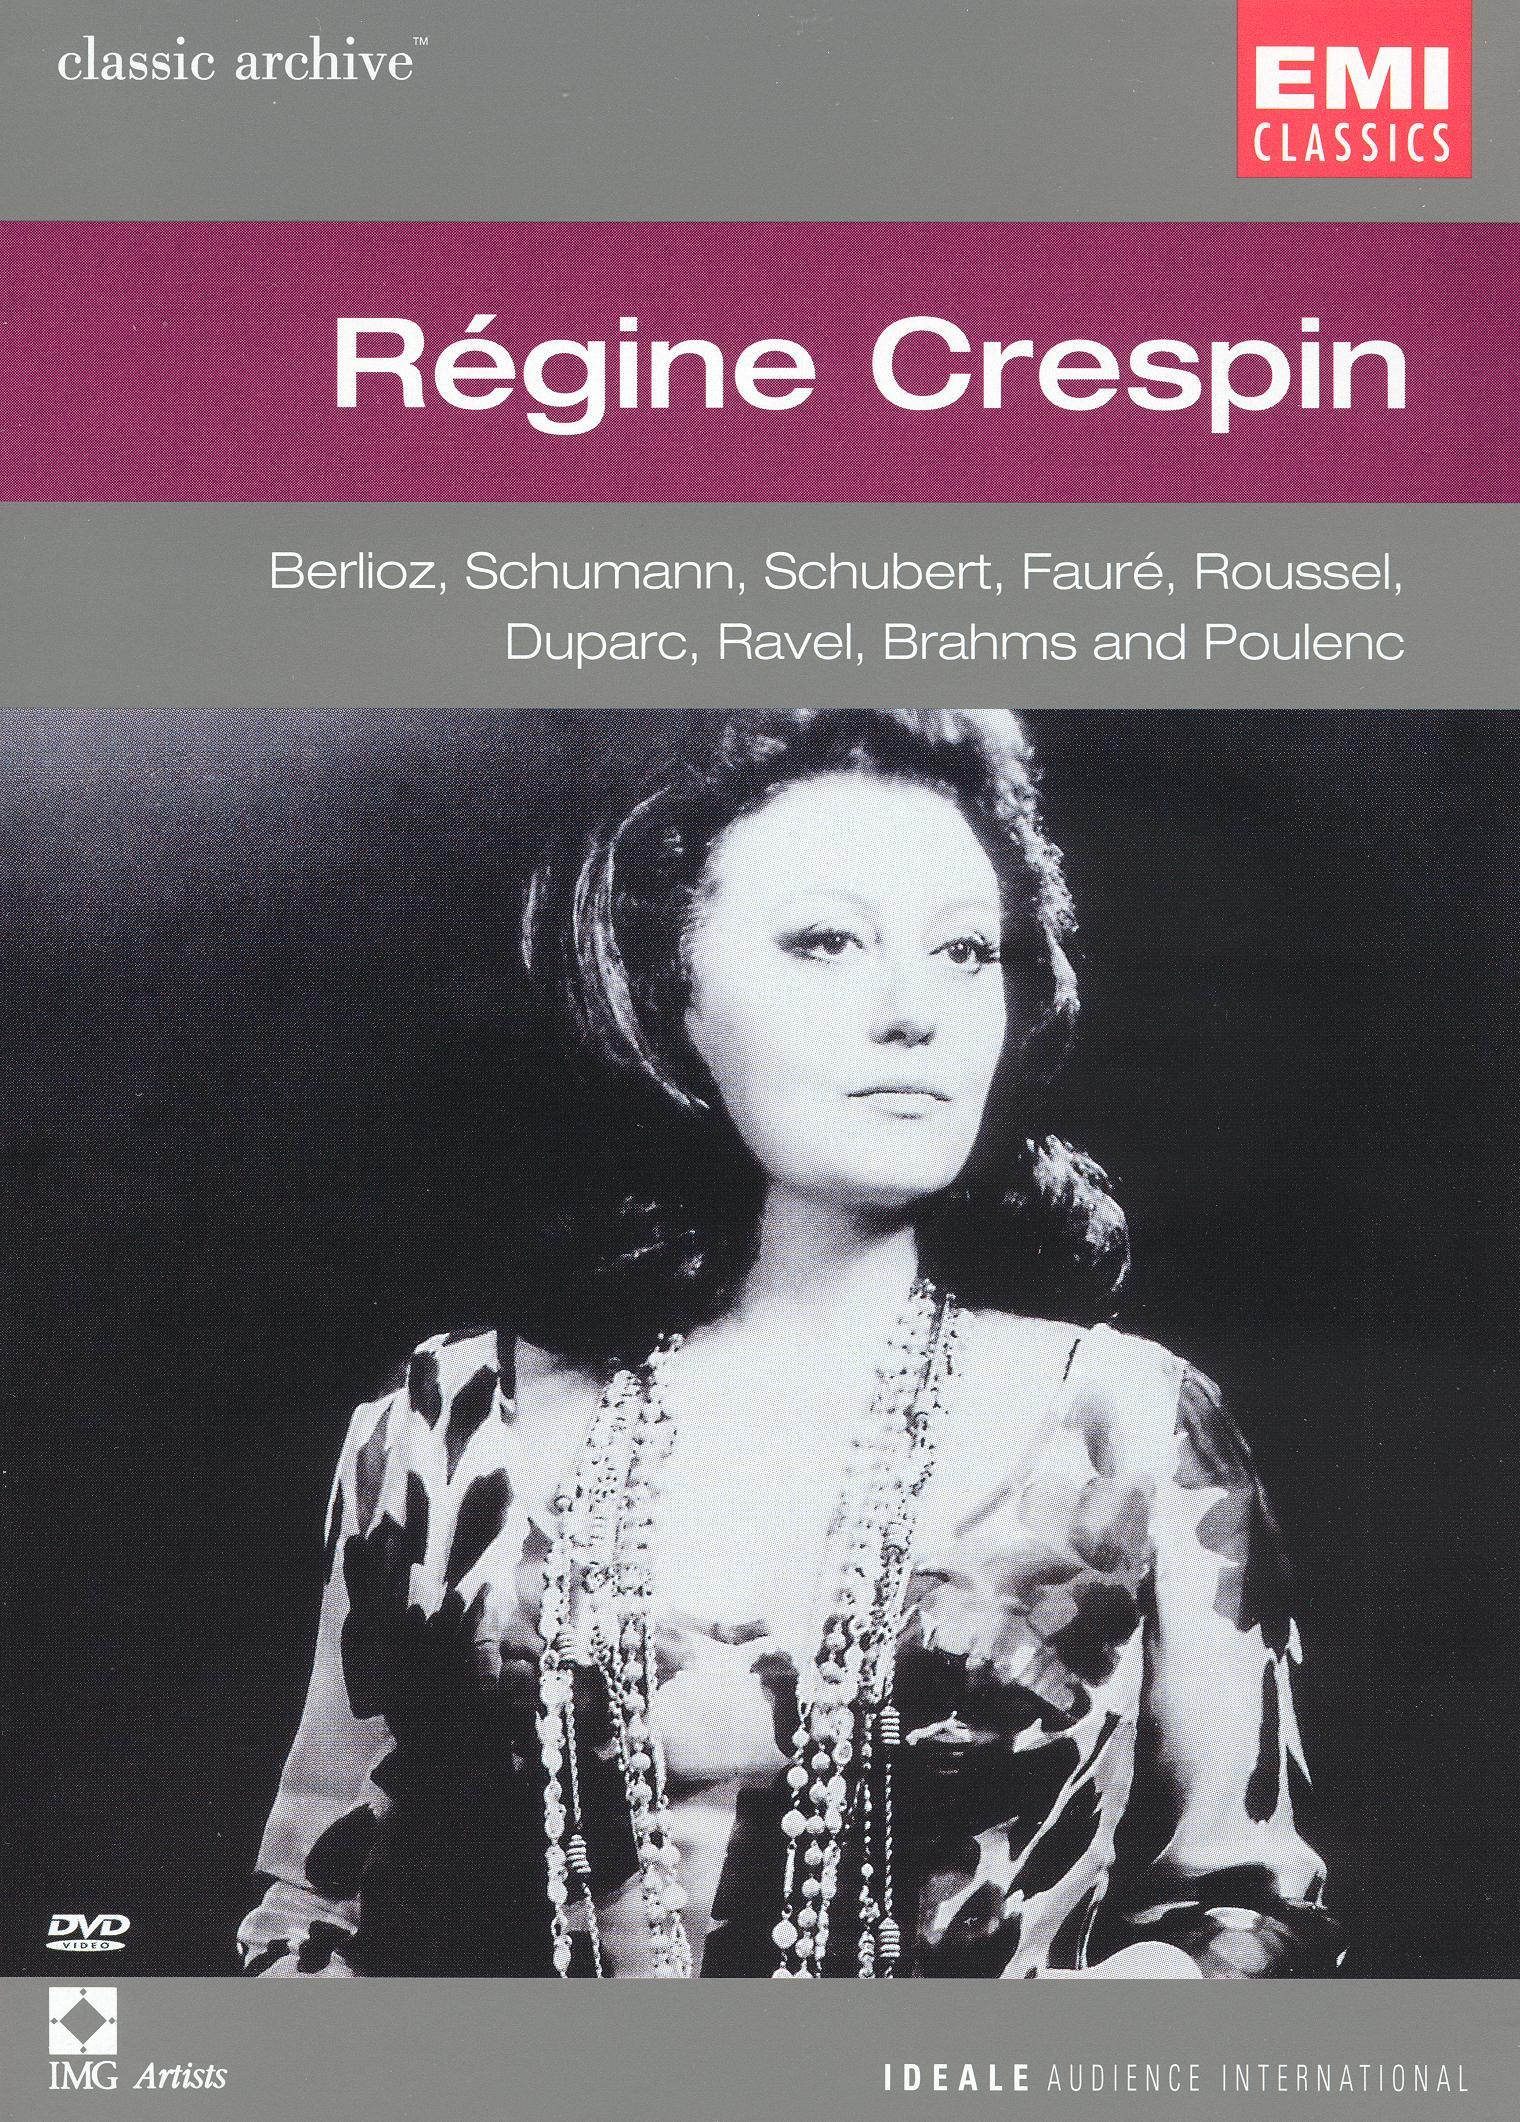 Classic Archive: Regine Crespin